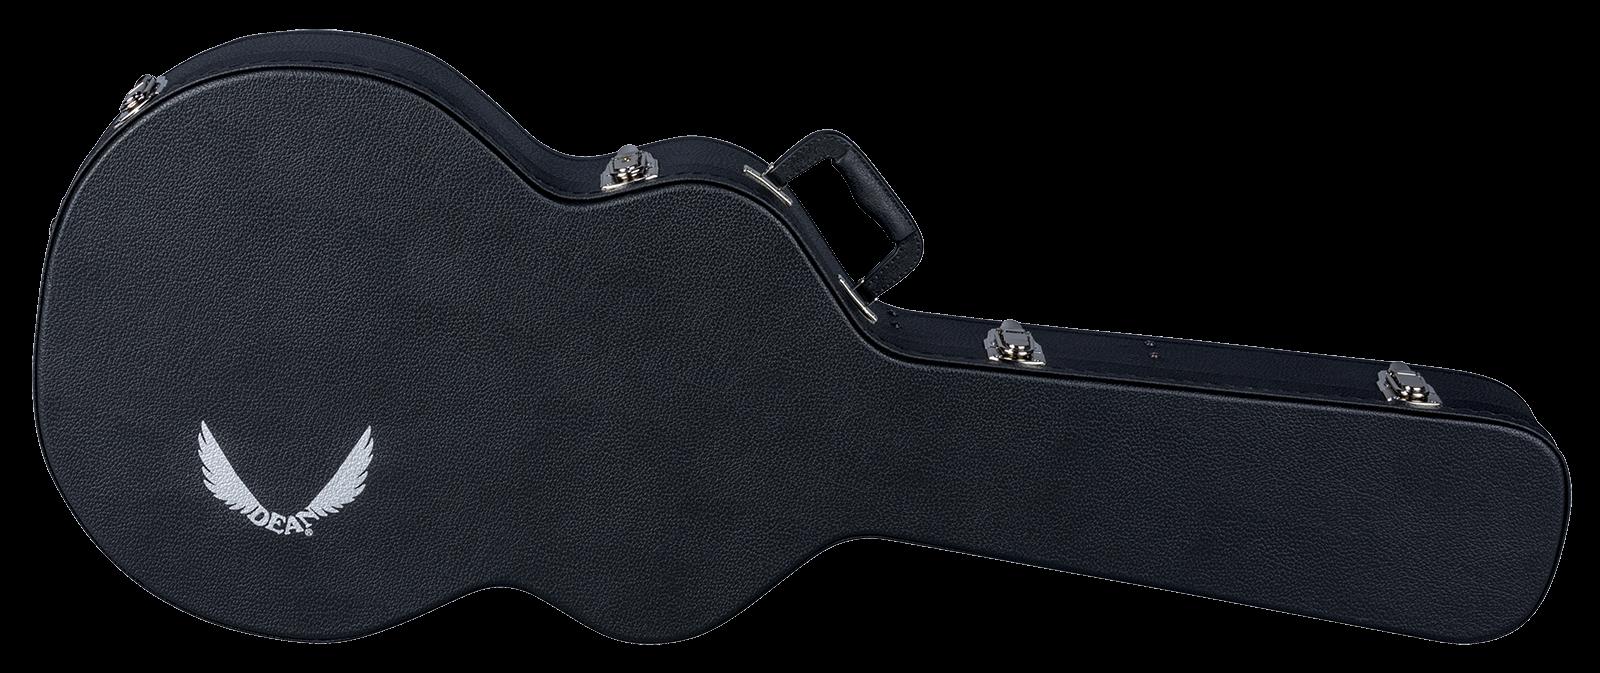 Dean Deluxe Hard Case Colt Series